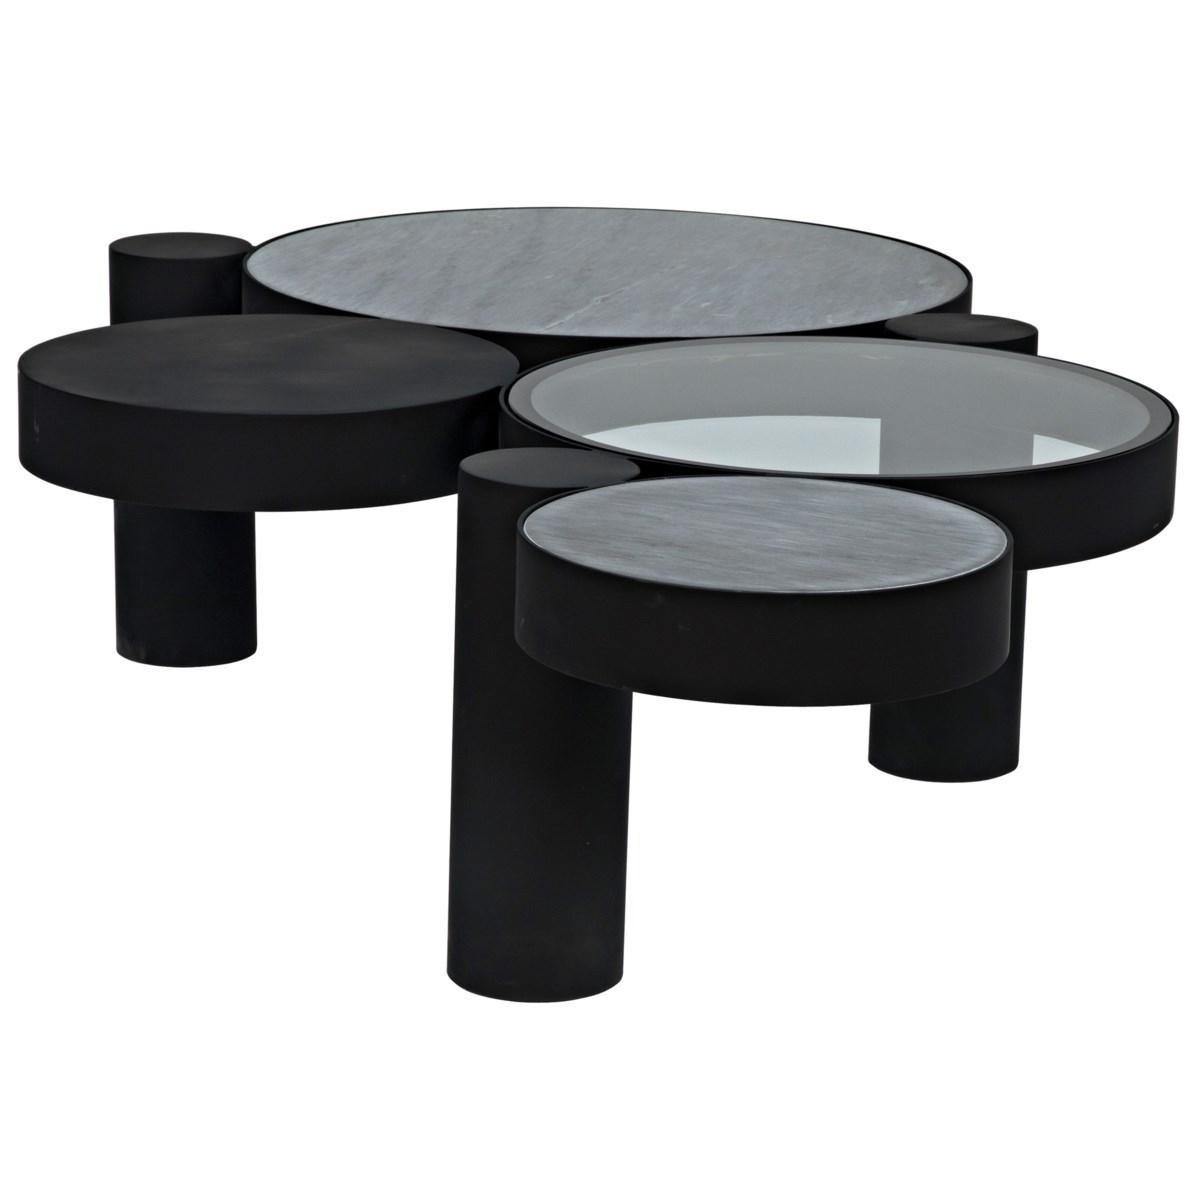 Trypo Coffee Table, Black Steel